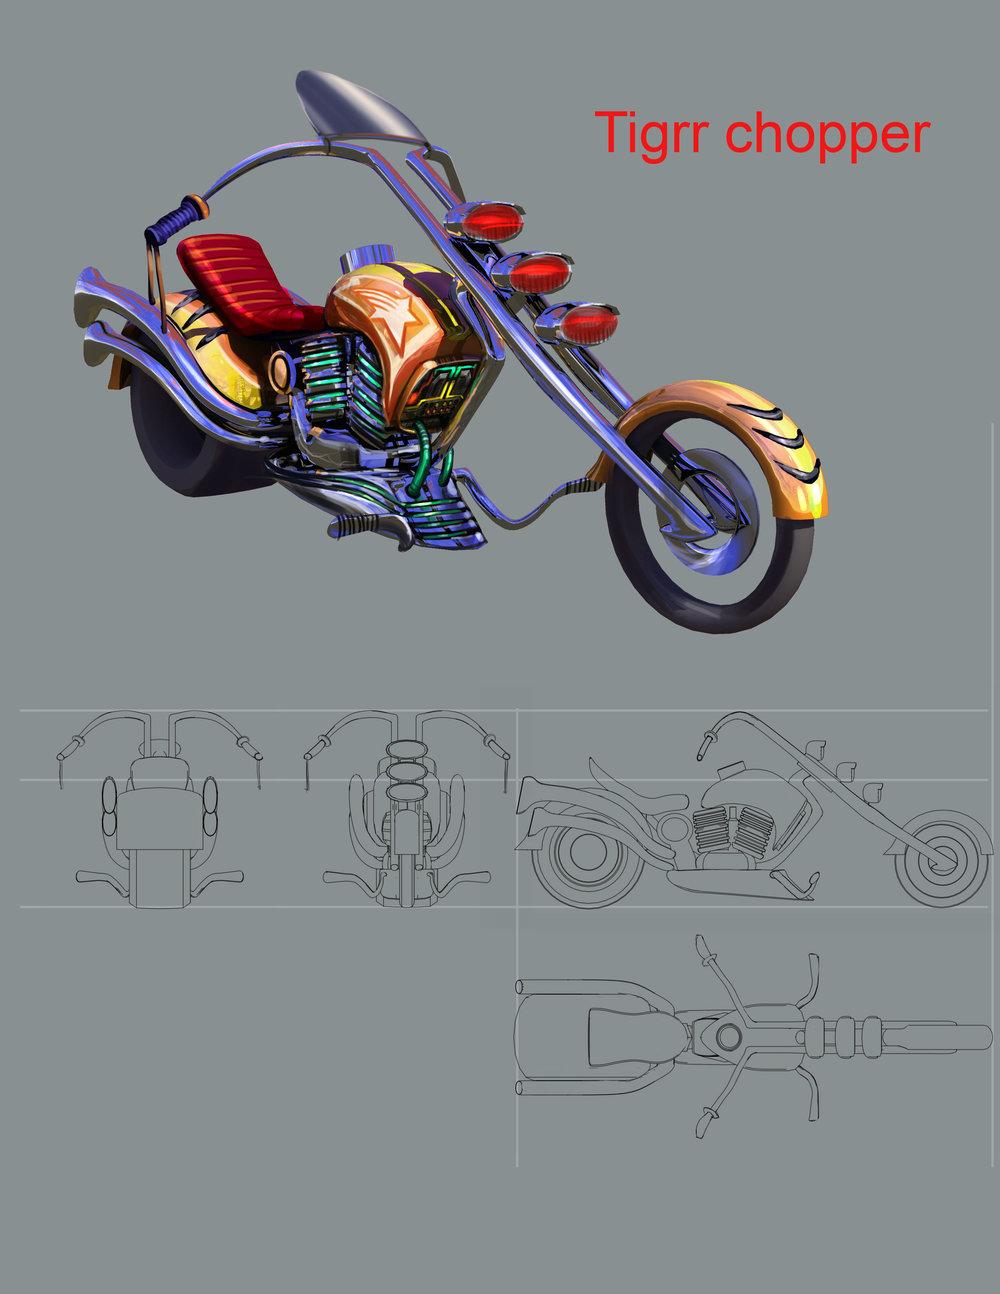 tiggr-chopper.jpg